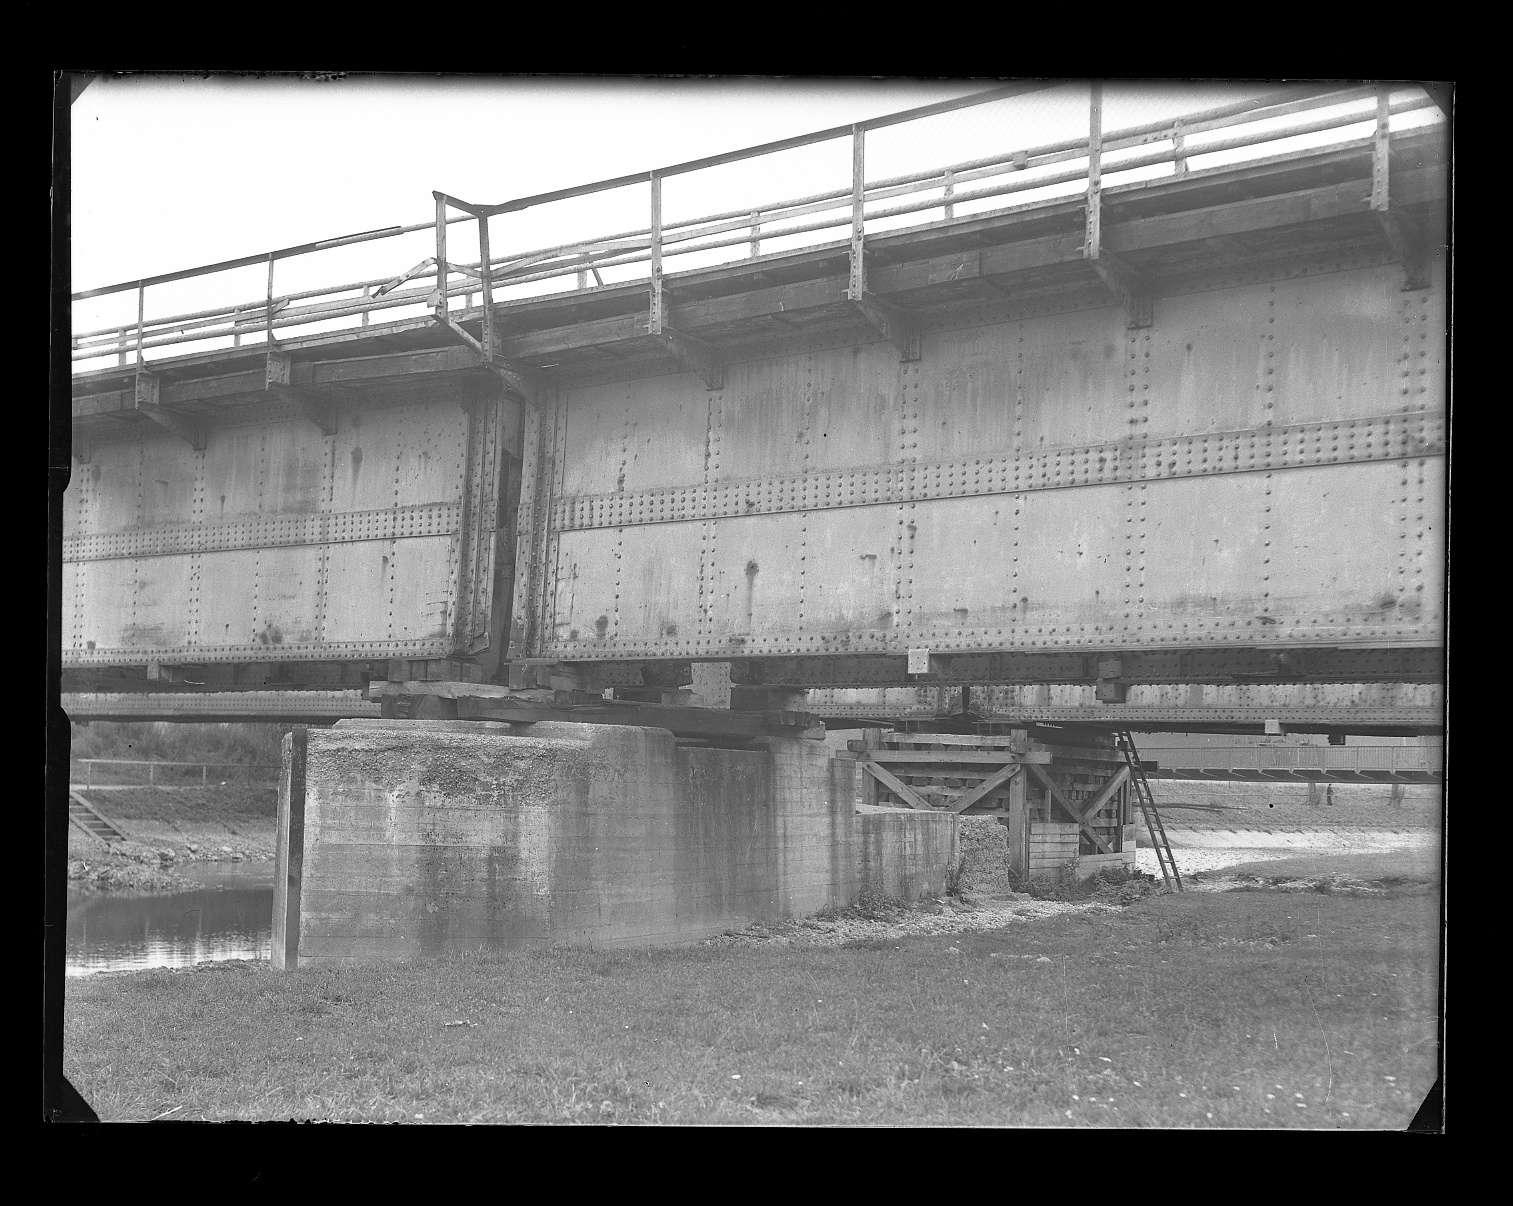 Tuttlingen, Bf, beschädigte Donaubrücke: Kriegsschaden (?), Bild 1